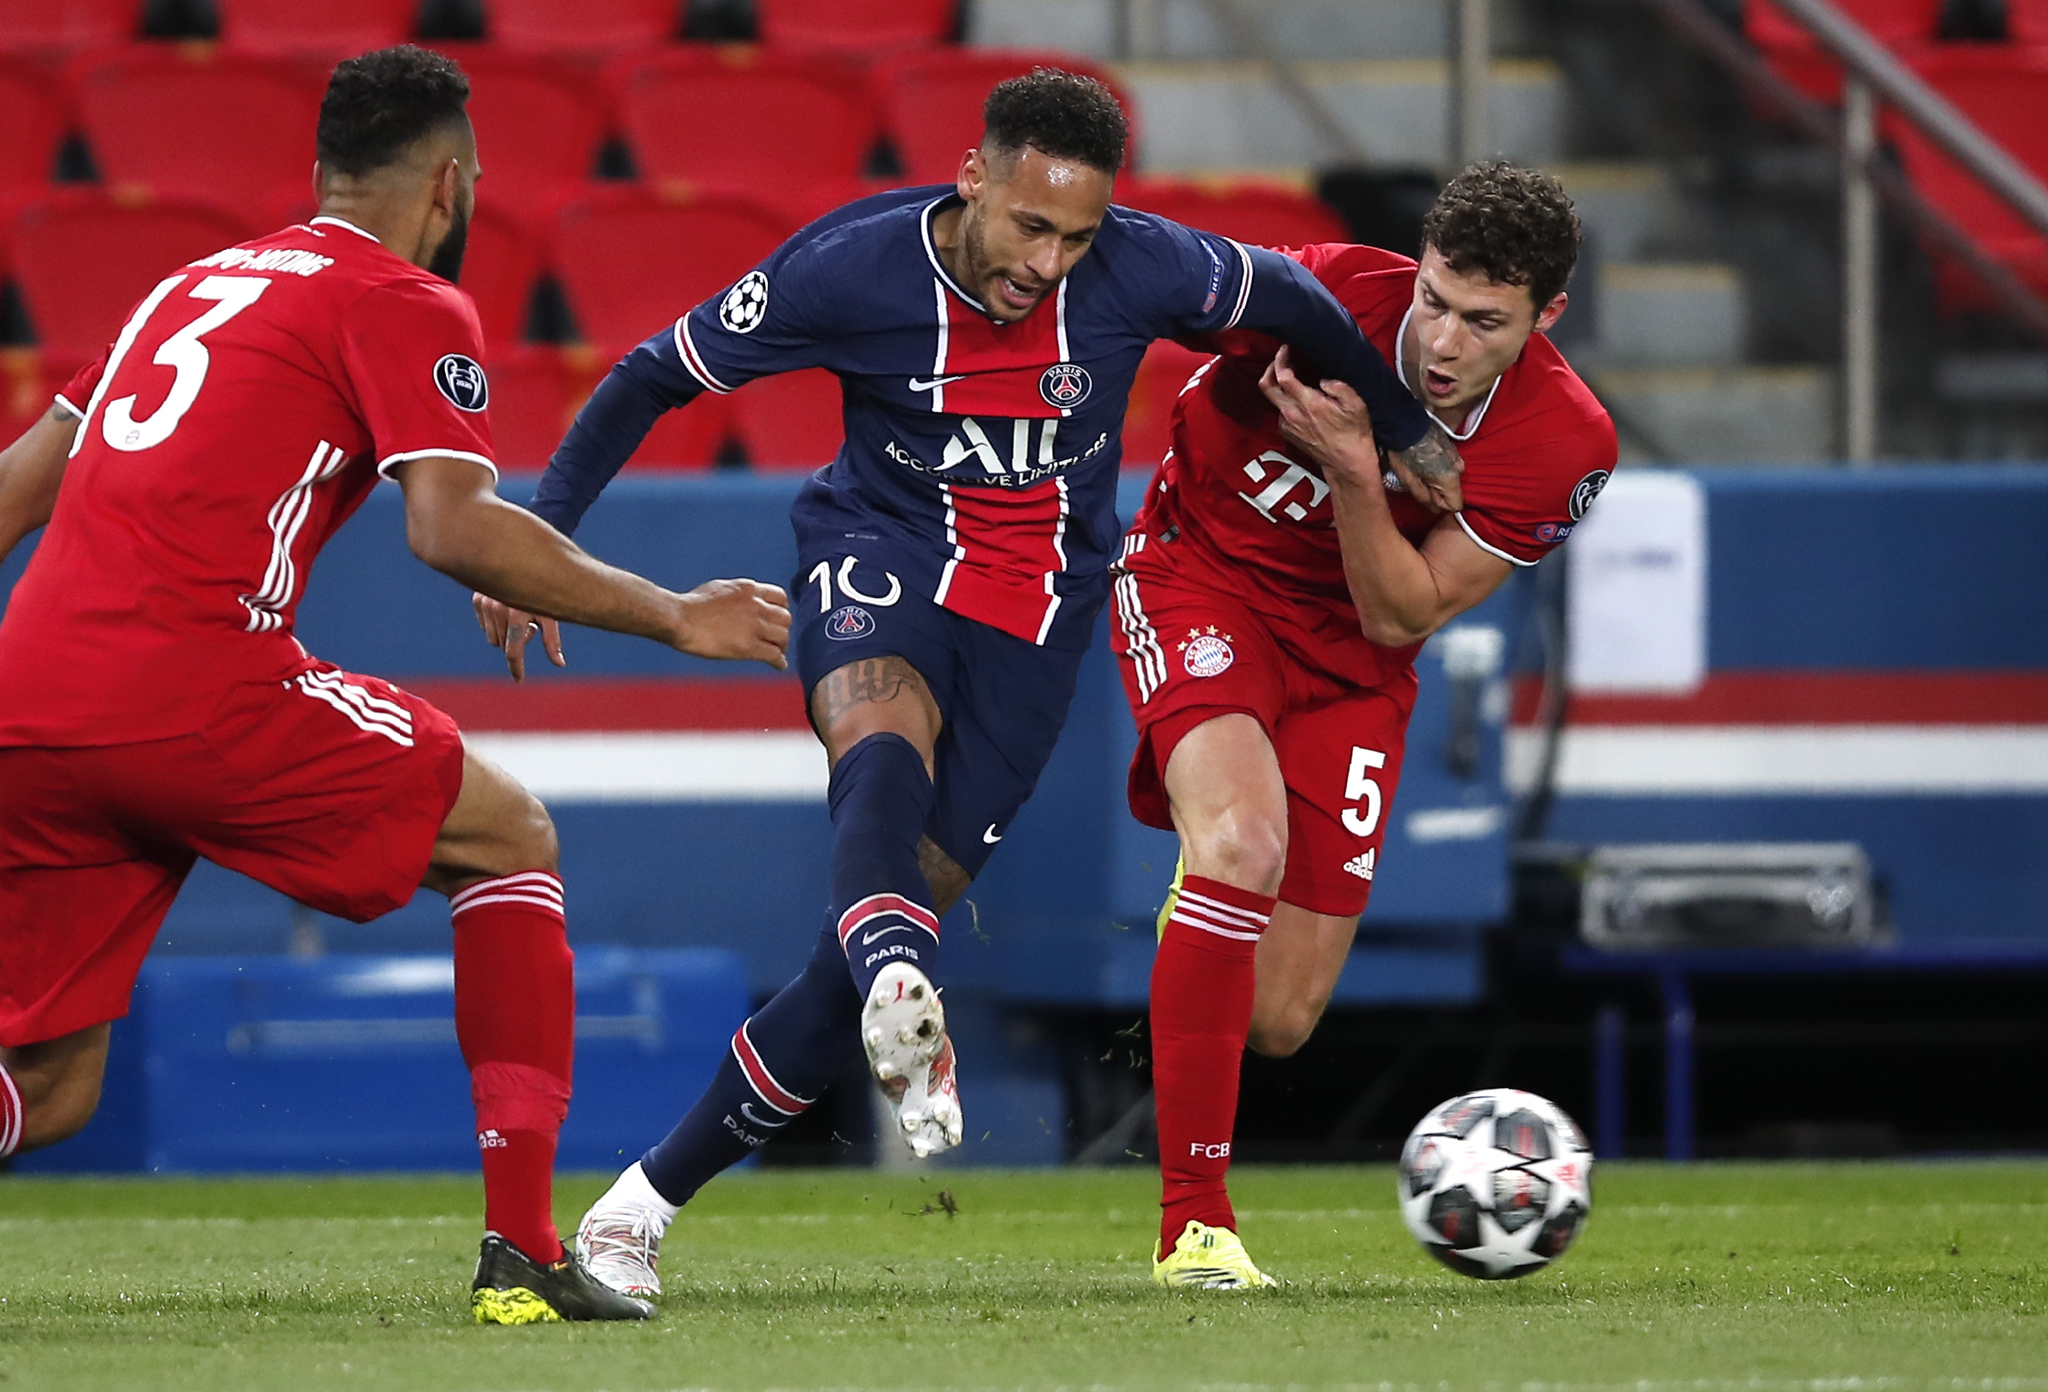 Paris Saint-Germain forward Neymar in action against Bayern Munich. Both teams are not in the European Super League.